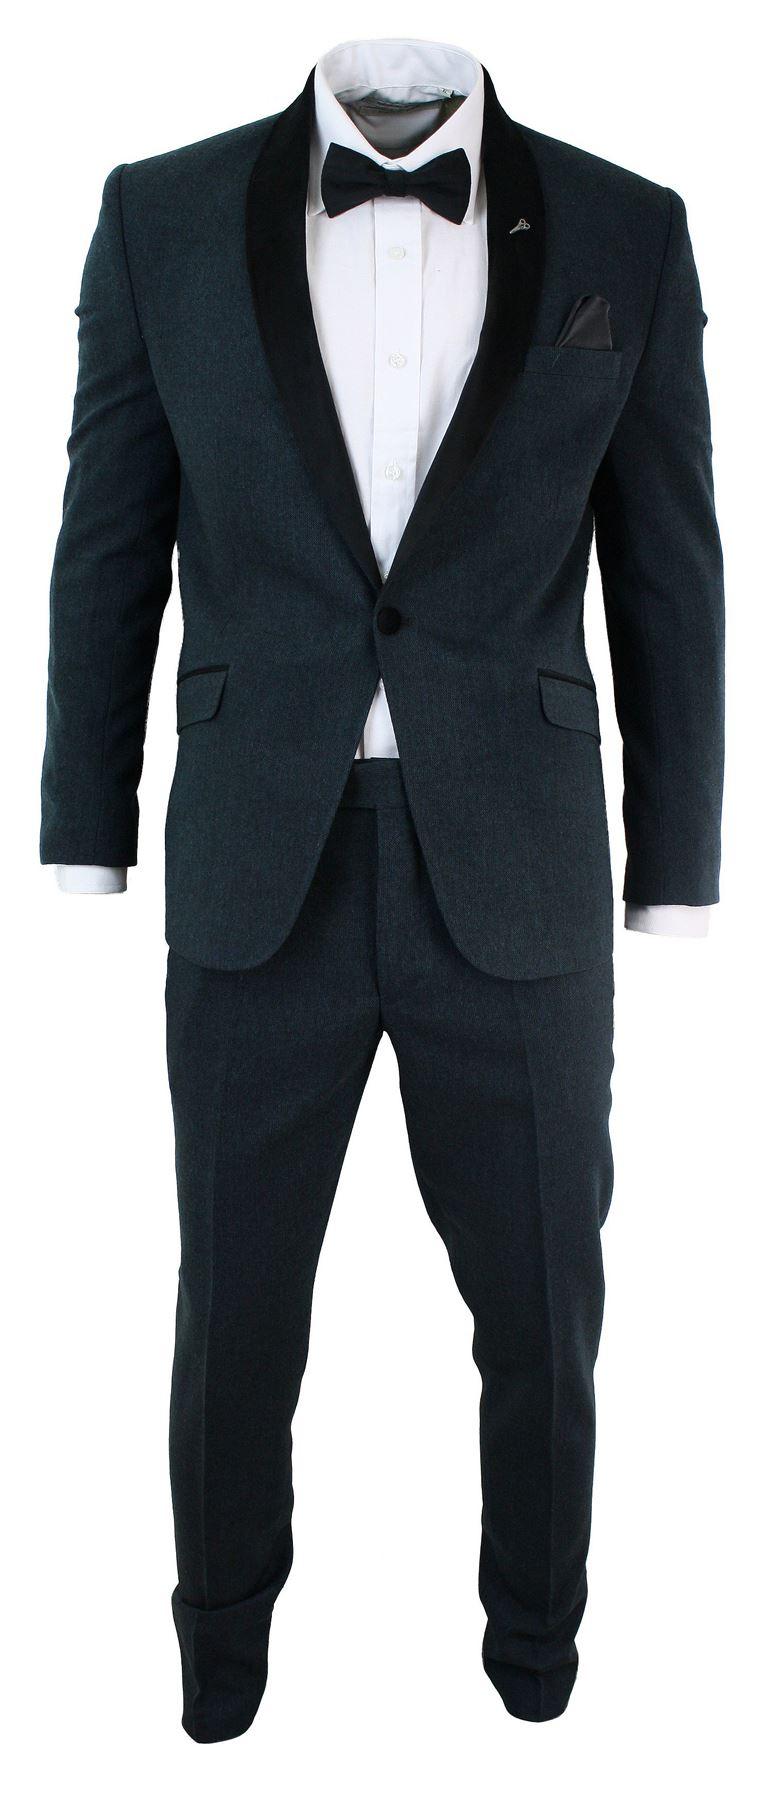 costume hommes 3 pi ces bleu fonc slim 1 bouton col et coudes en velours noir ebay. Black Bedroom Furniture Sets. Home Design Ideas